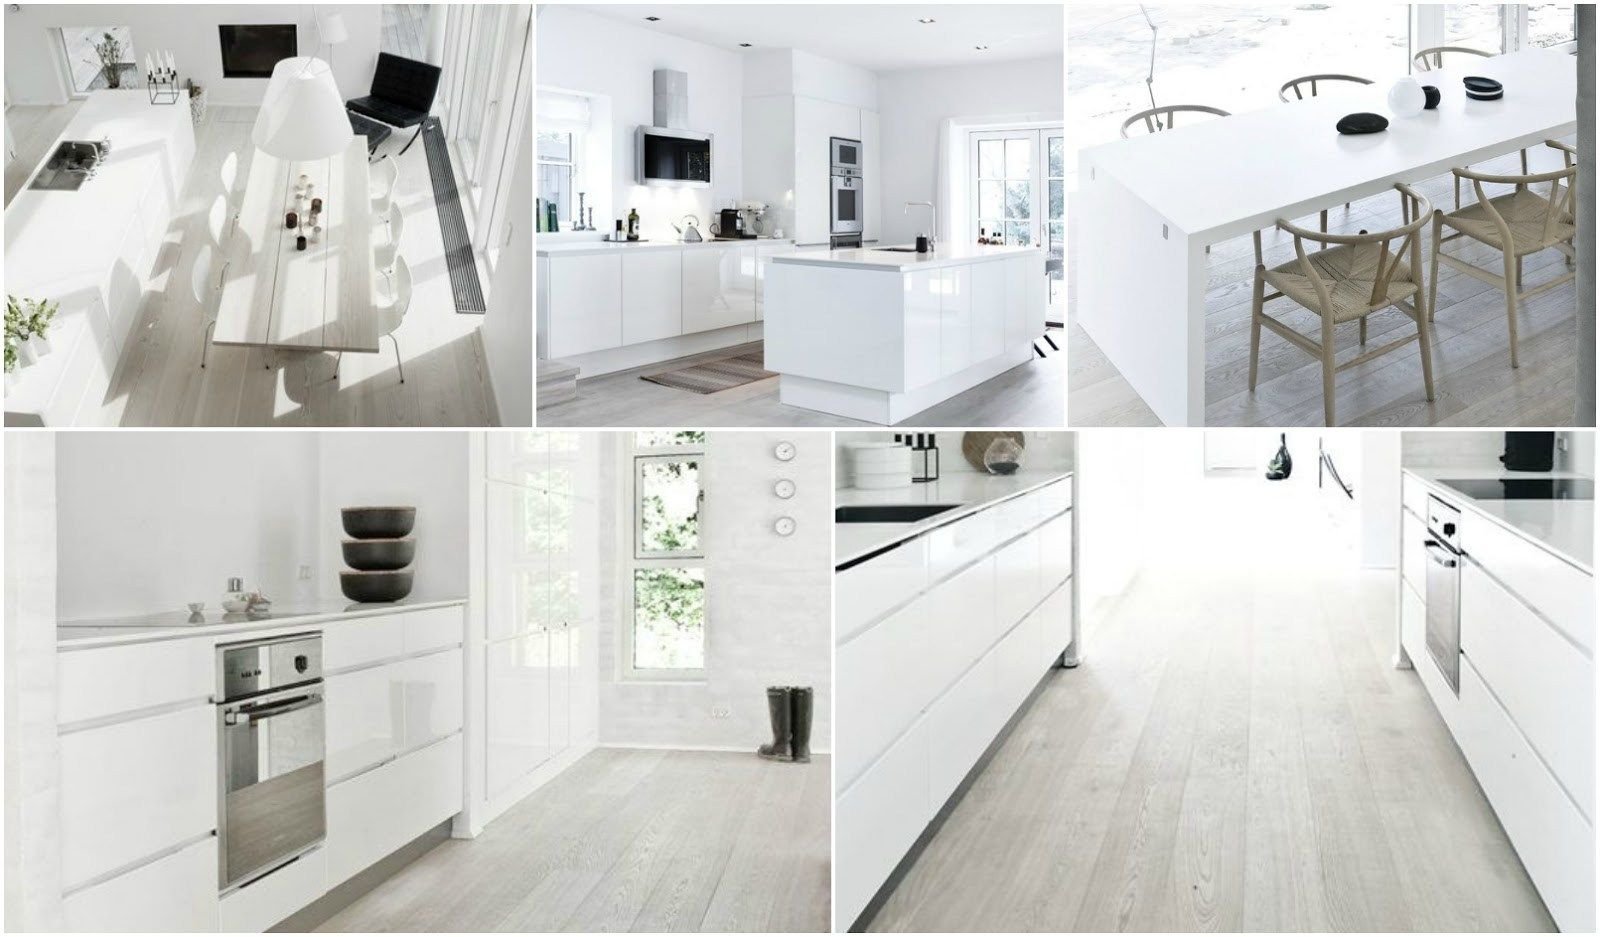 family im dreaming woodlaminate ing grey laminate flooring, Innenarchitektur ideen